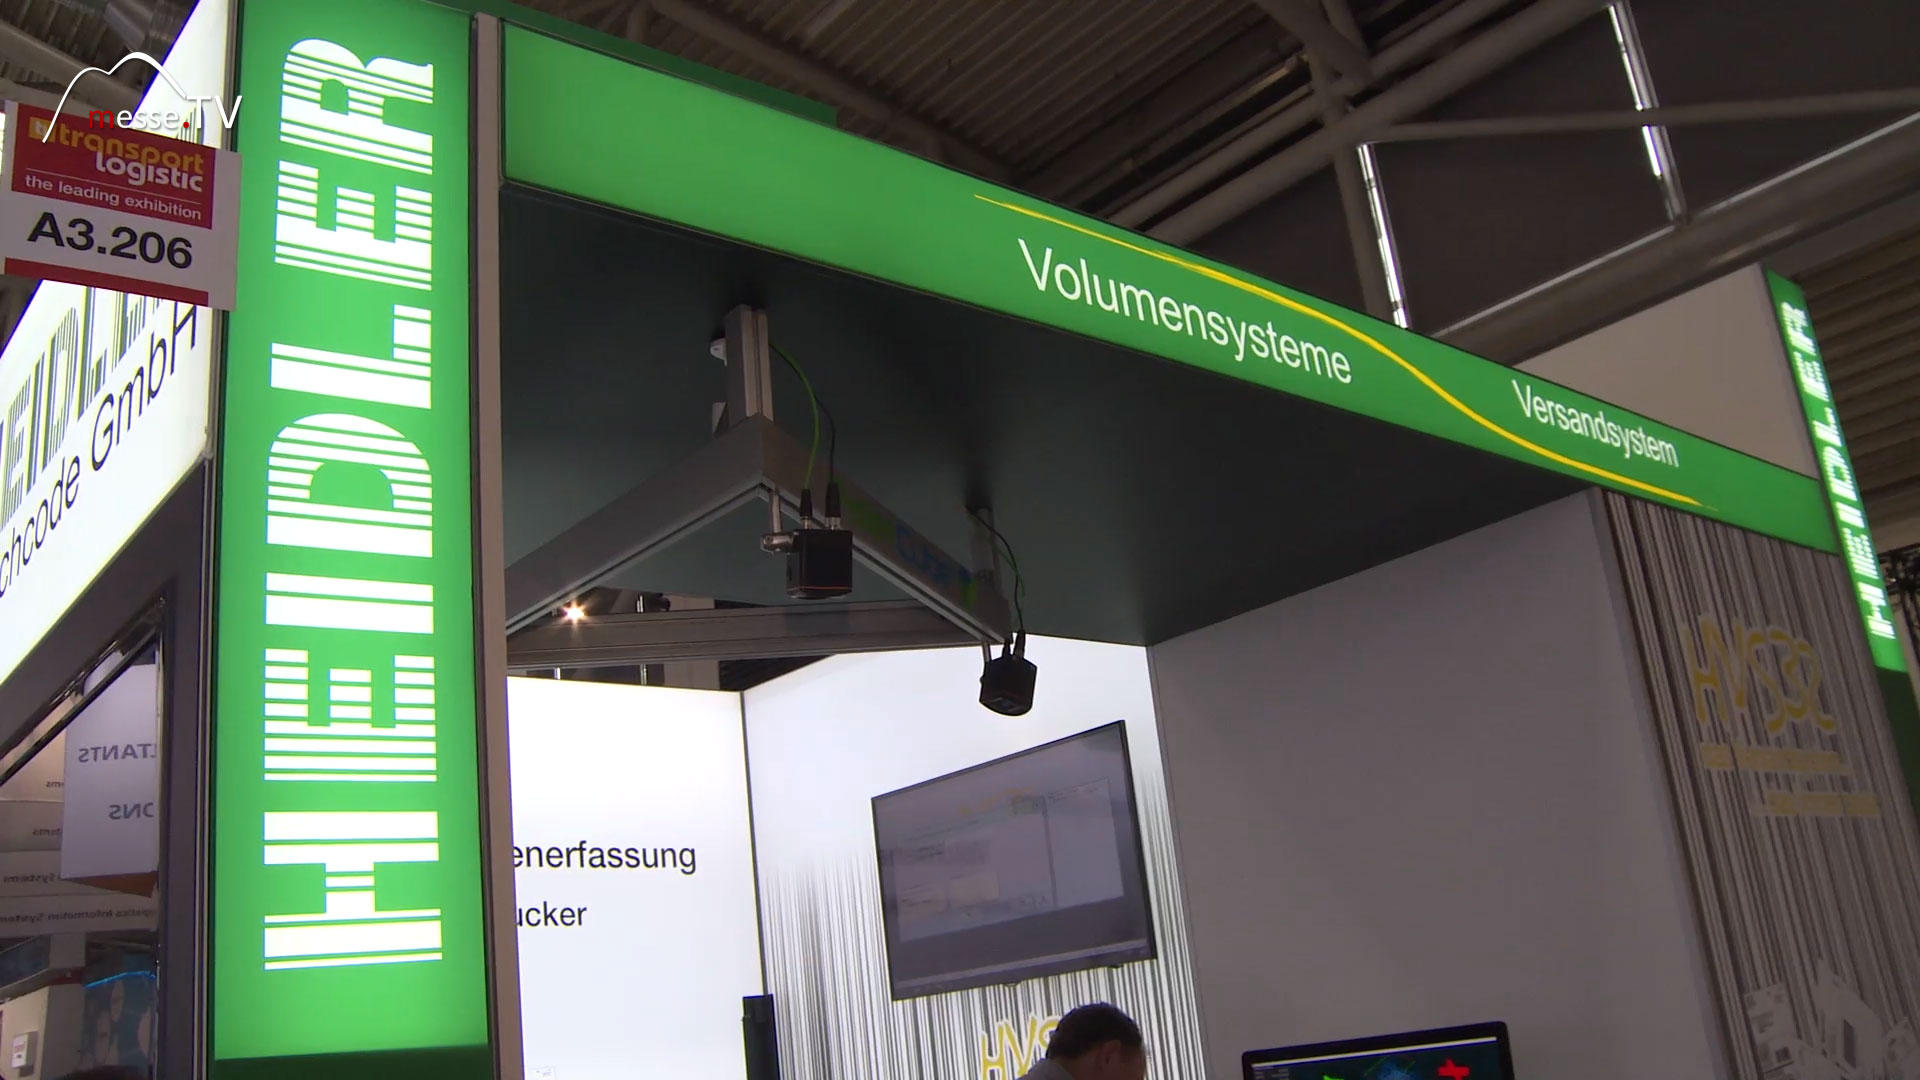 HEIDLER Messestand transport logistic 2019 Messe München